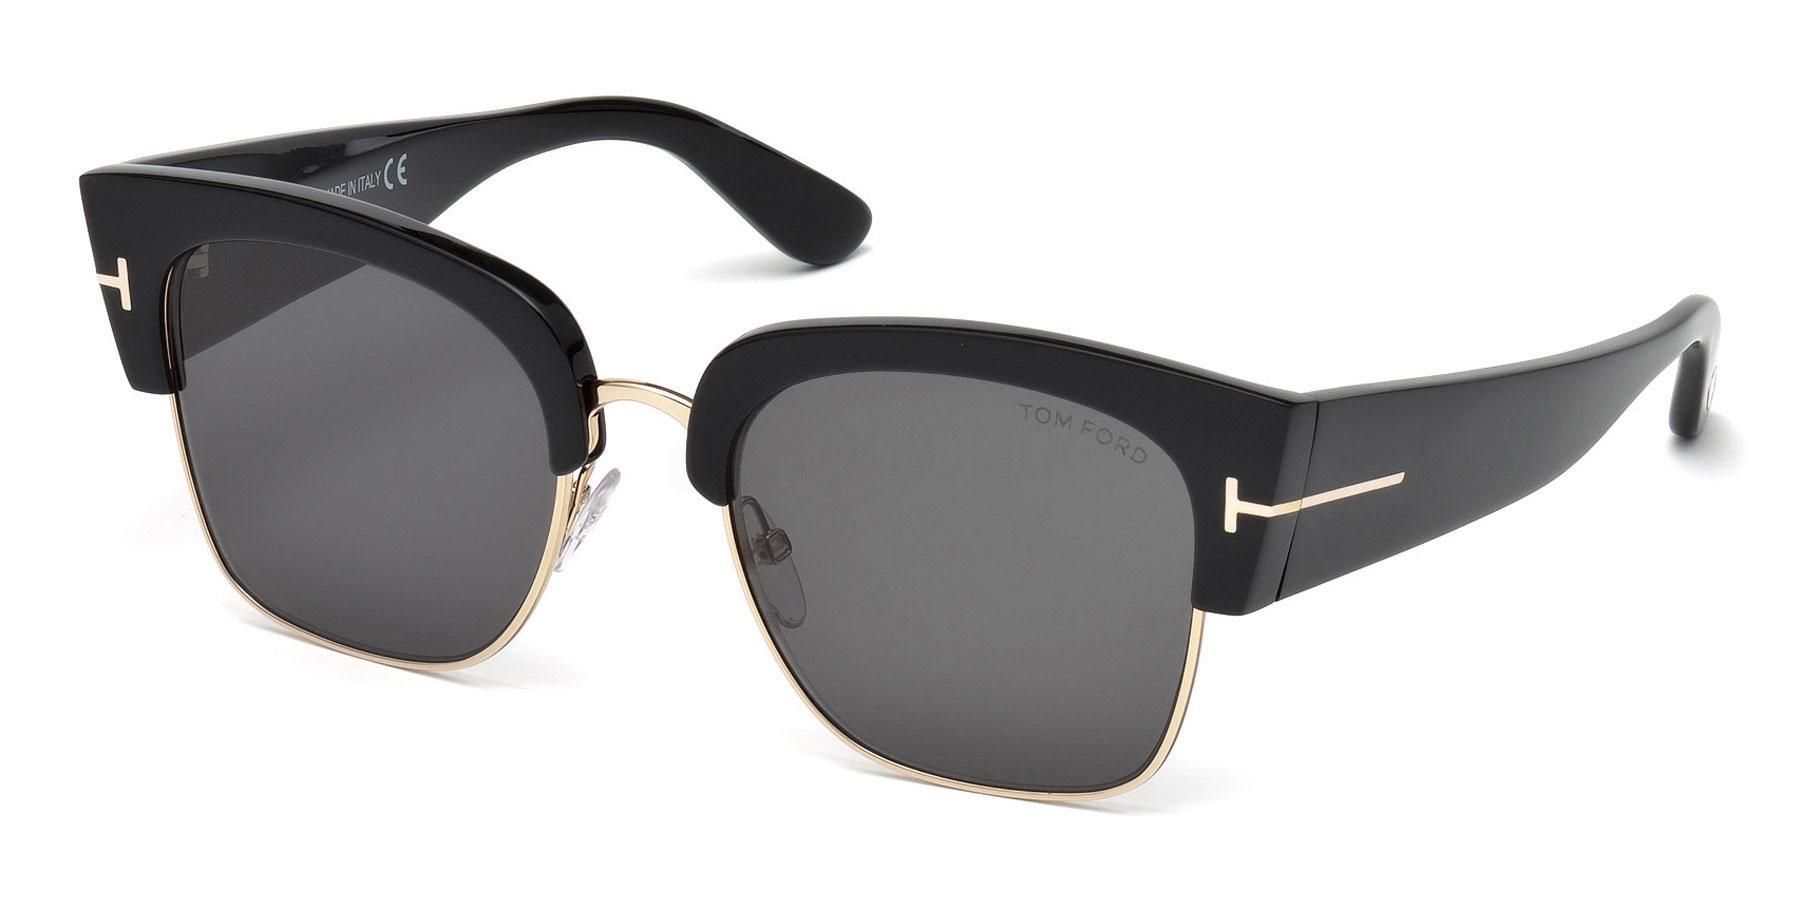 01A FT0554 Sunglasses, Tom Ford